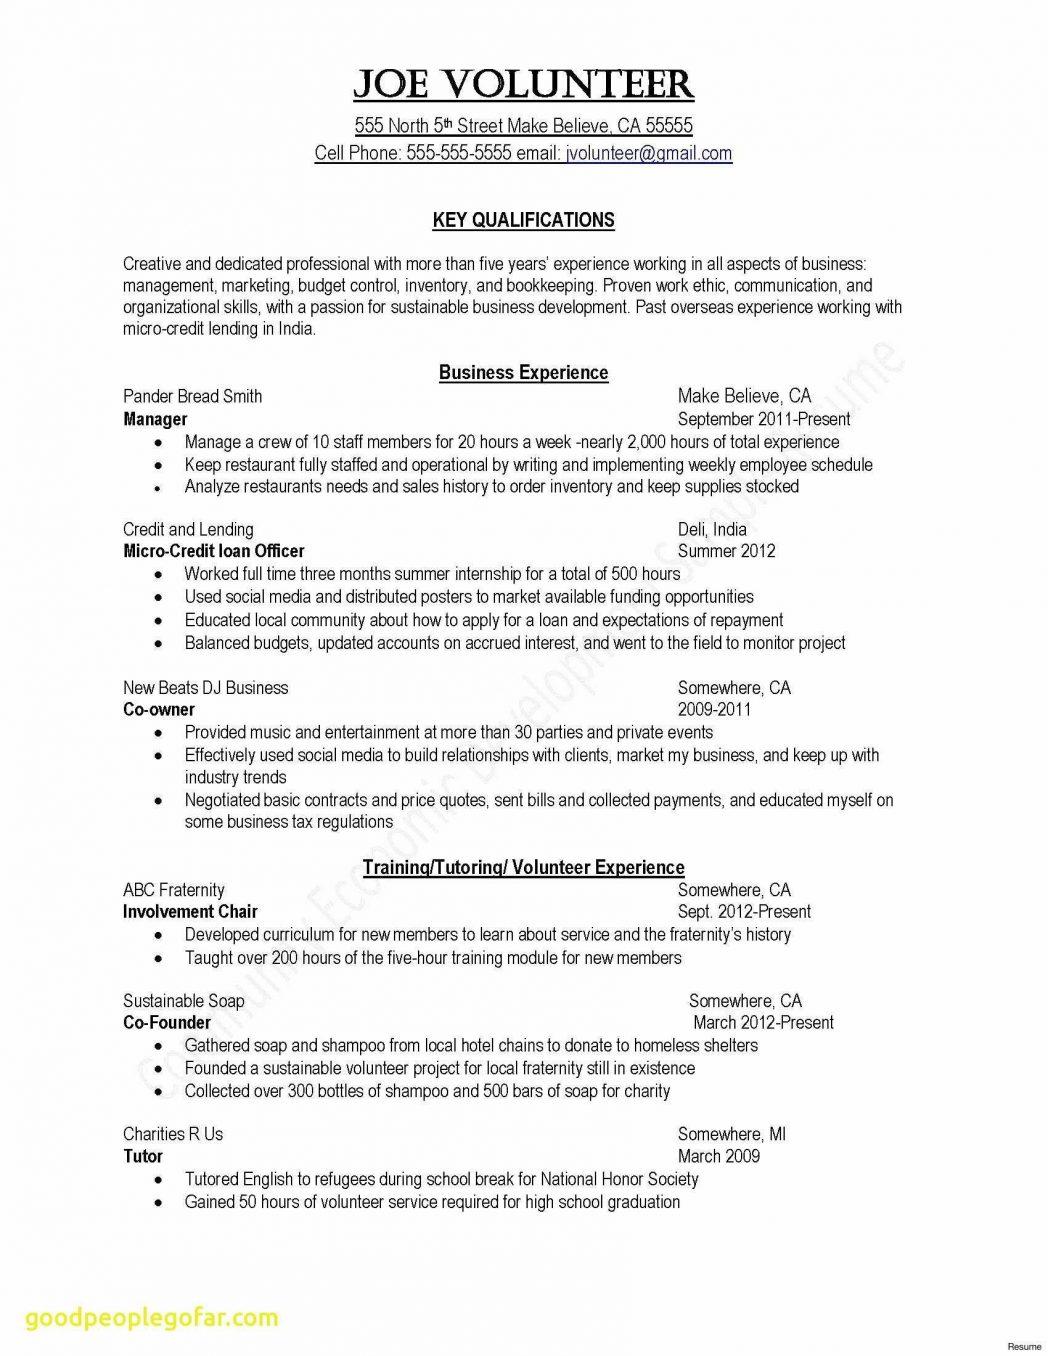 Resume Objective Statement Quality Inspector Kizi E Best Of 99 Control Automotive Sample Samples Assurance Cv Objective Example 1048x1356 resume objective statement wikiresume.com